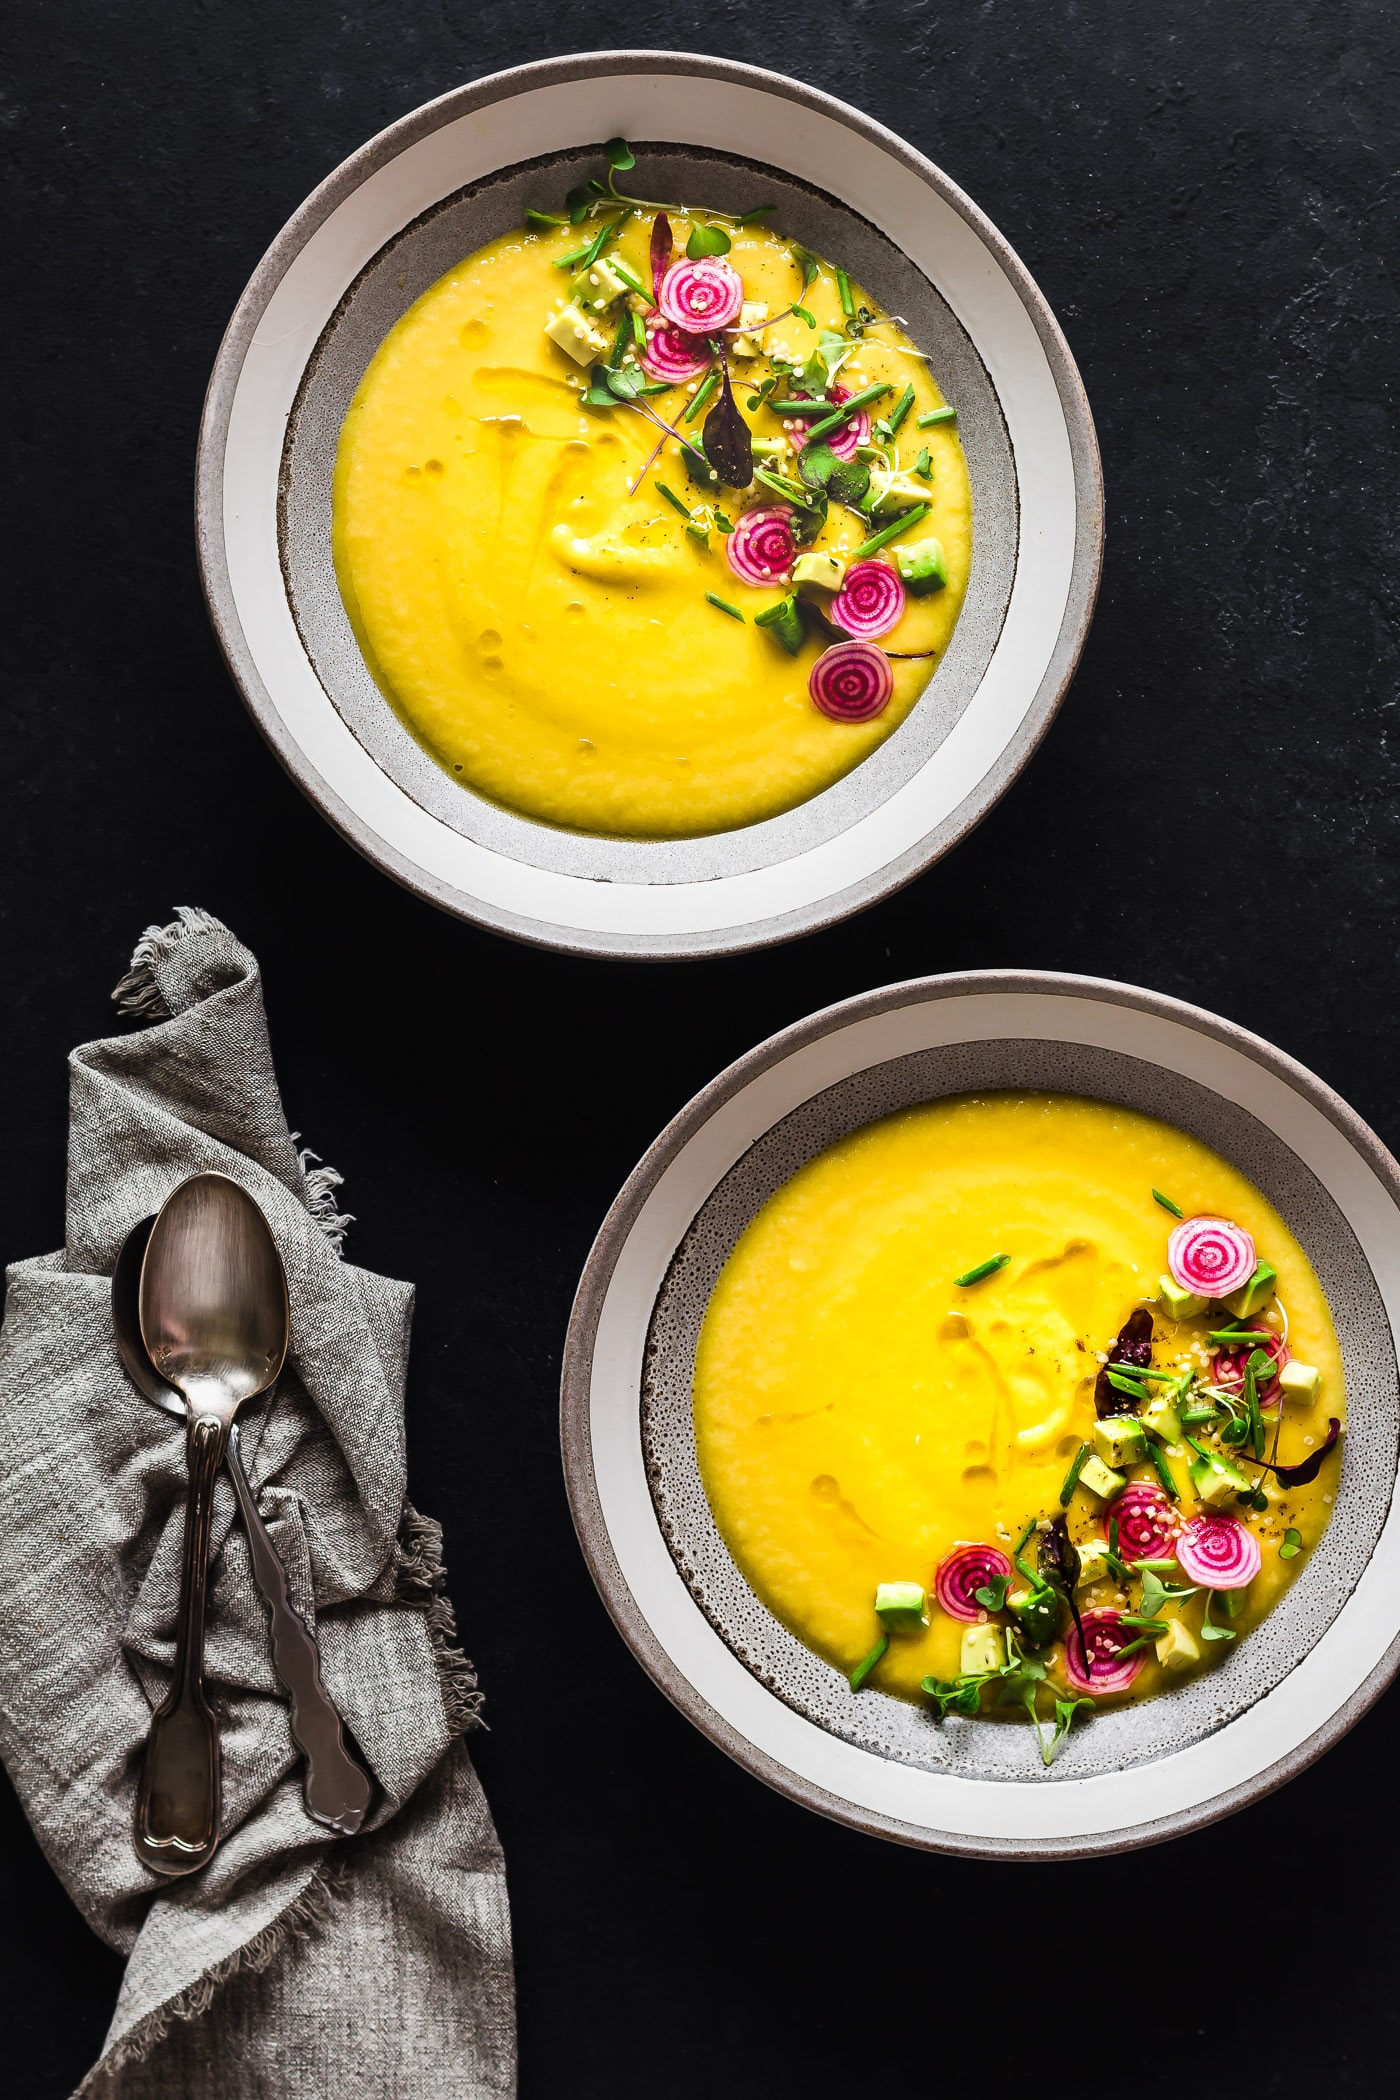 Golden Beet Gazpacho